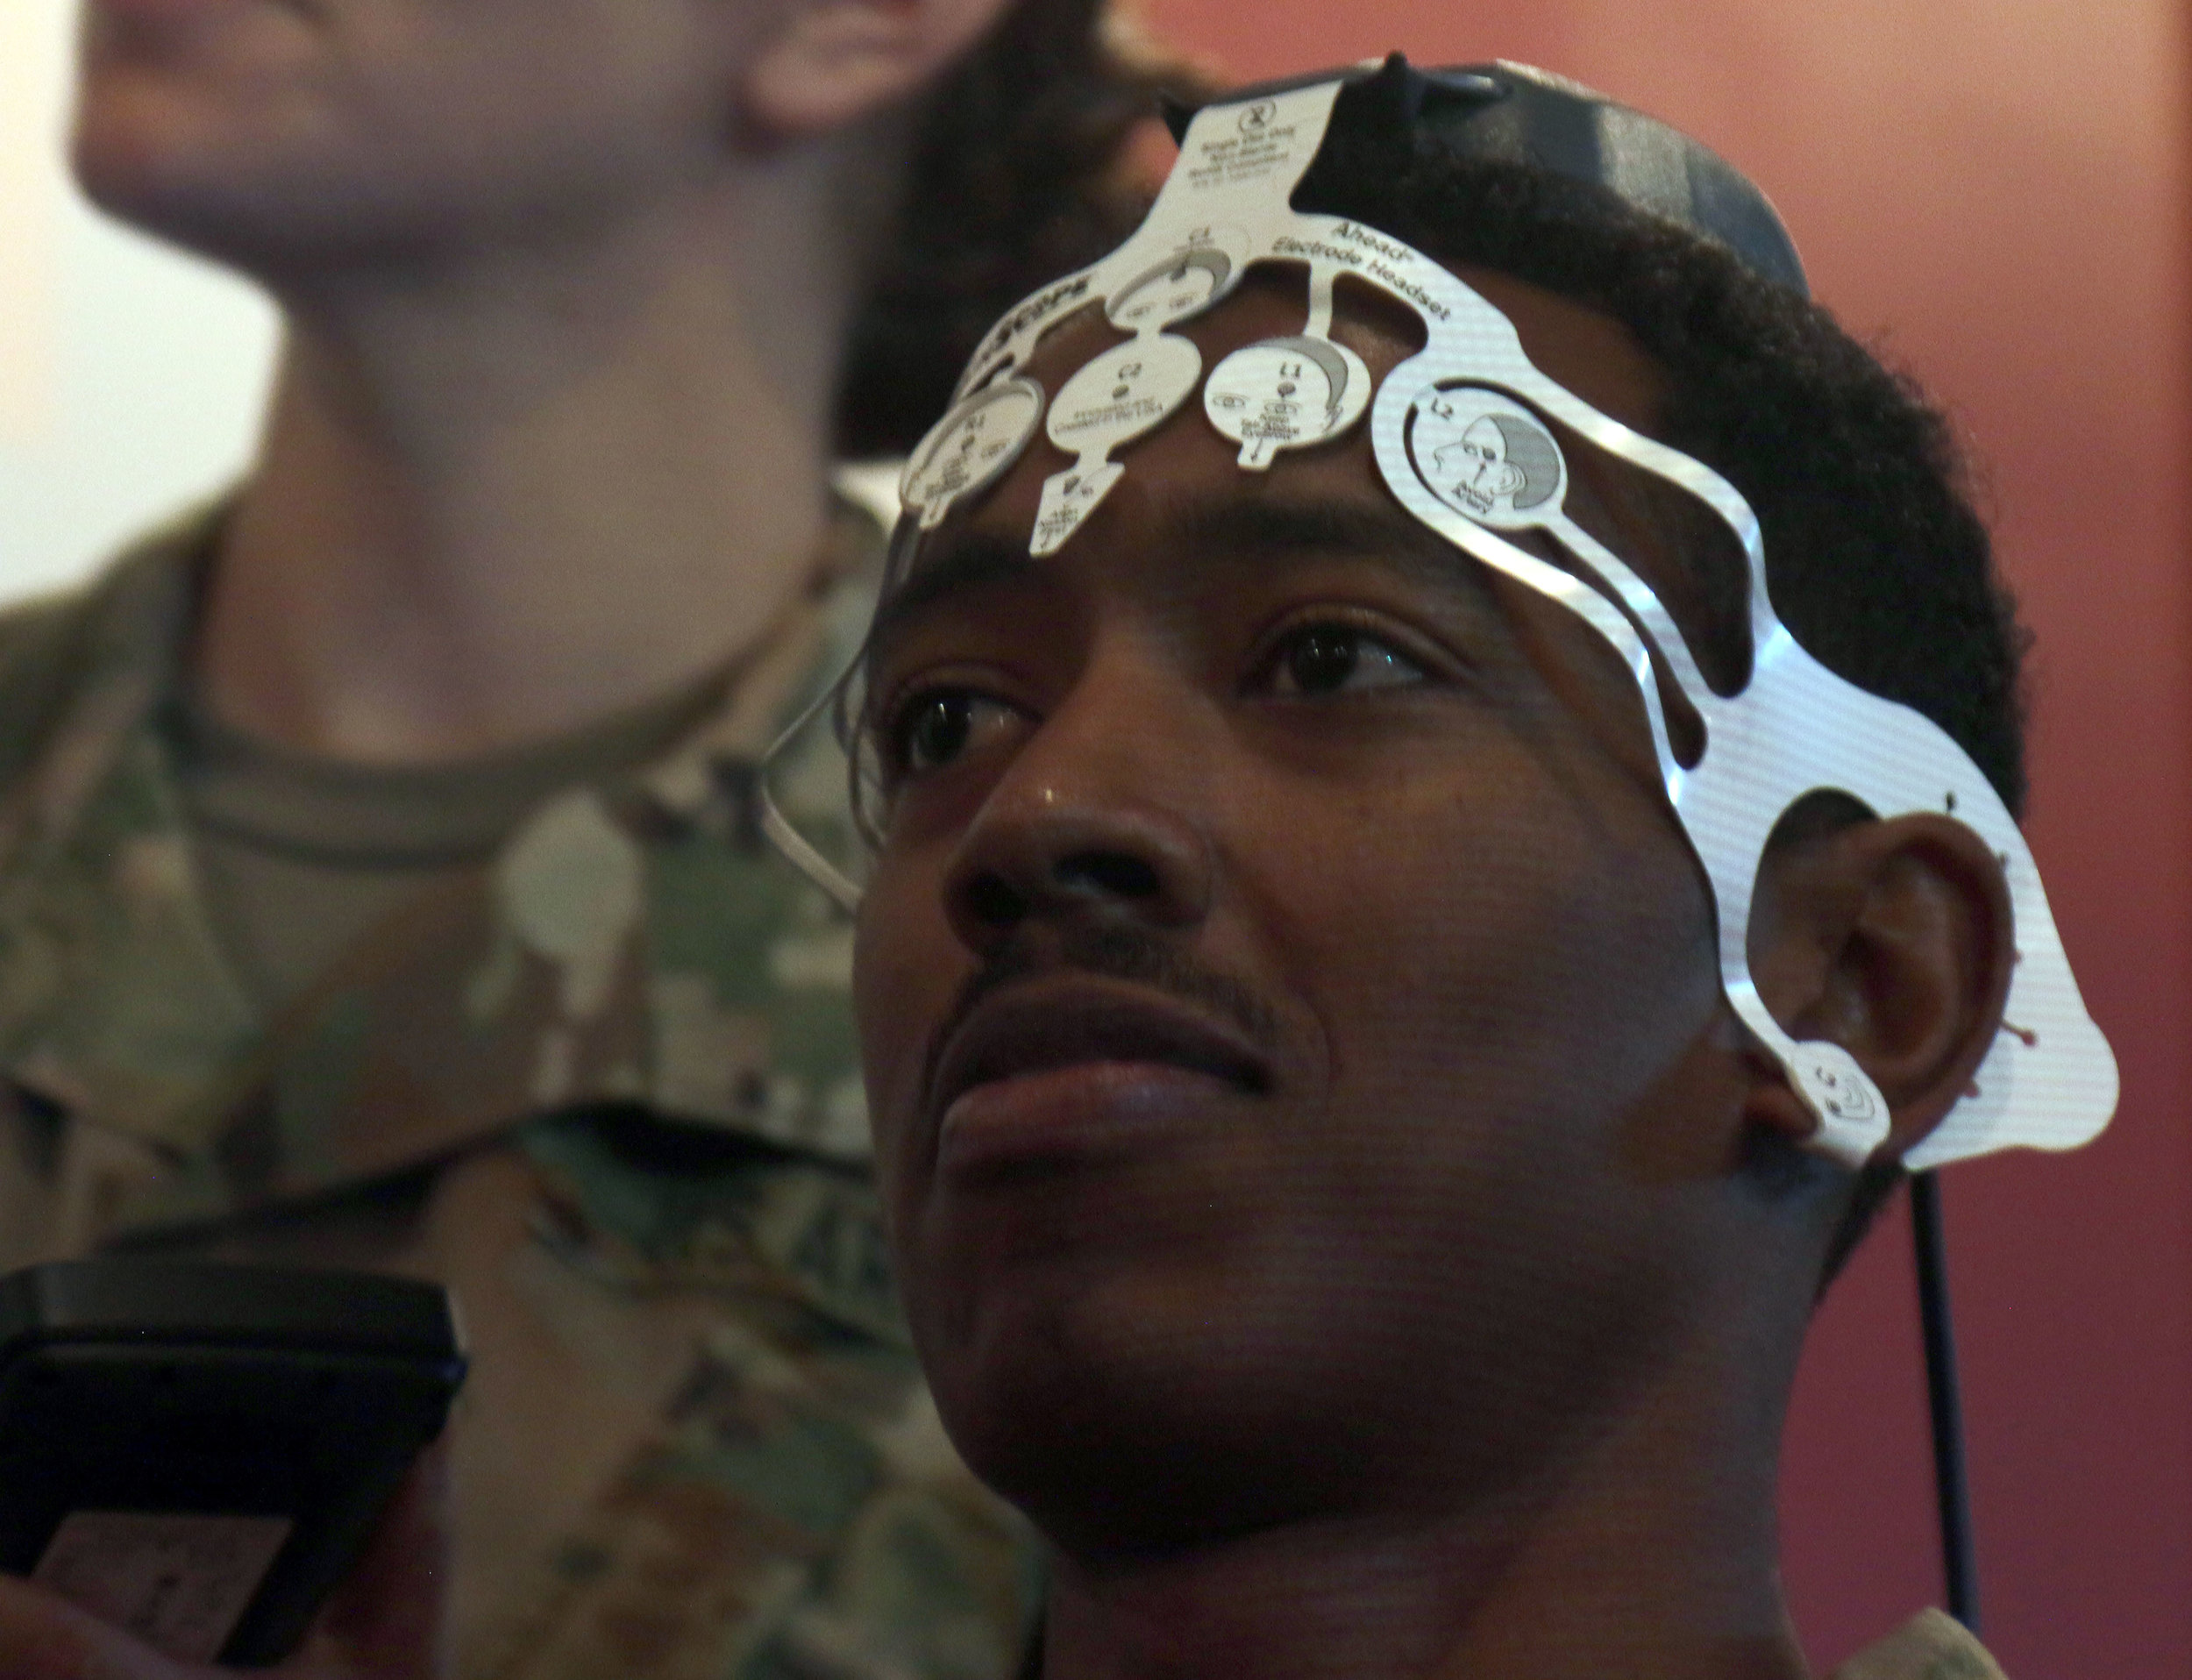 Brainscope-452d Combat Support Hospital-training.jpg